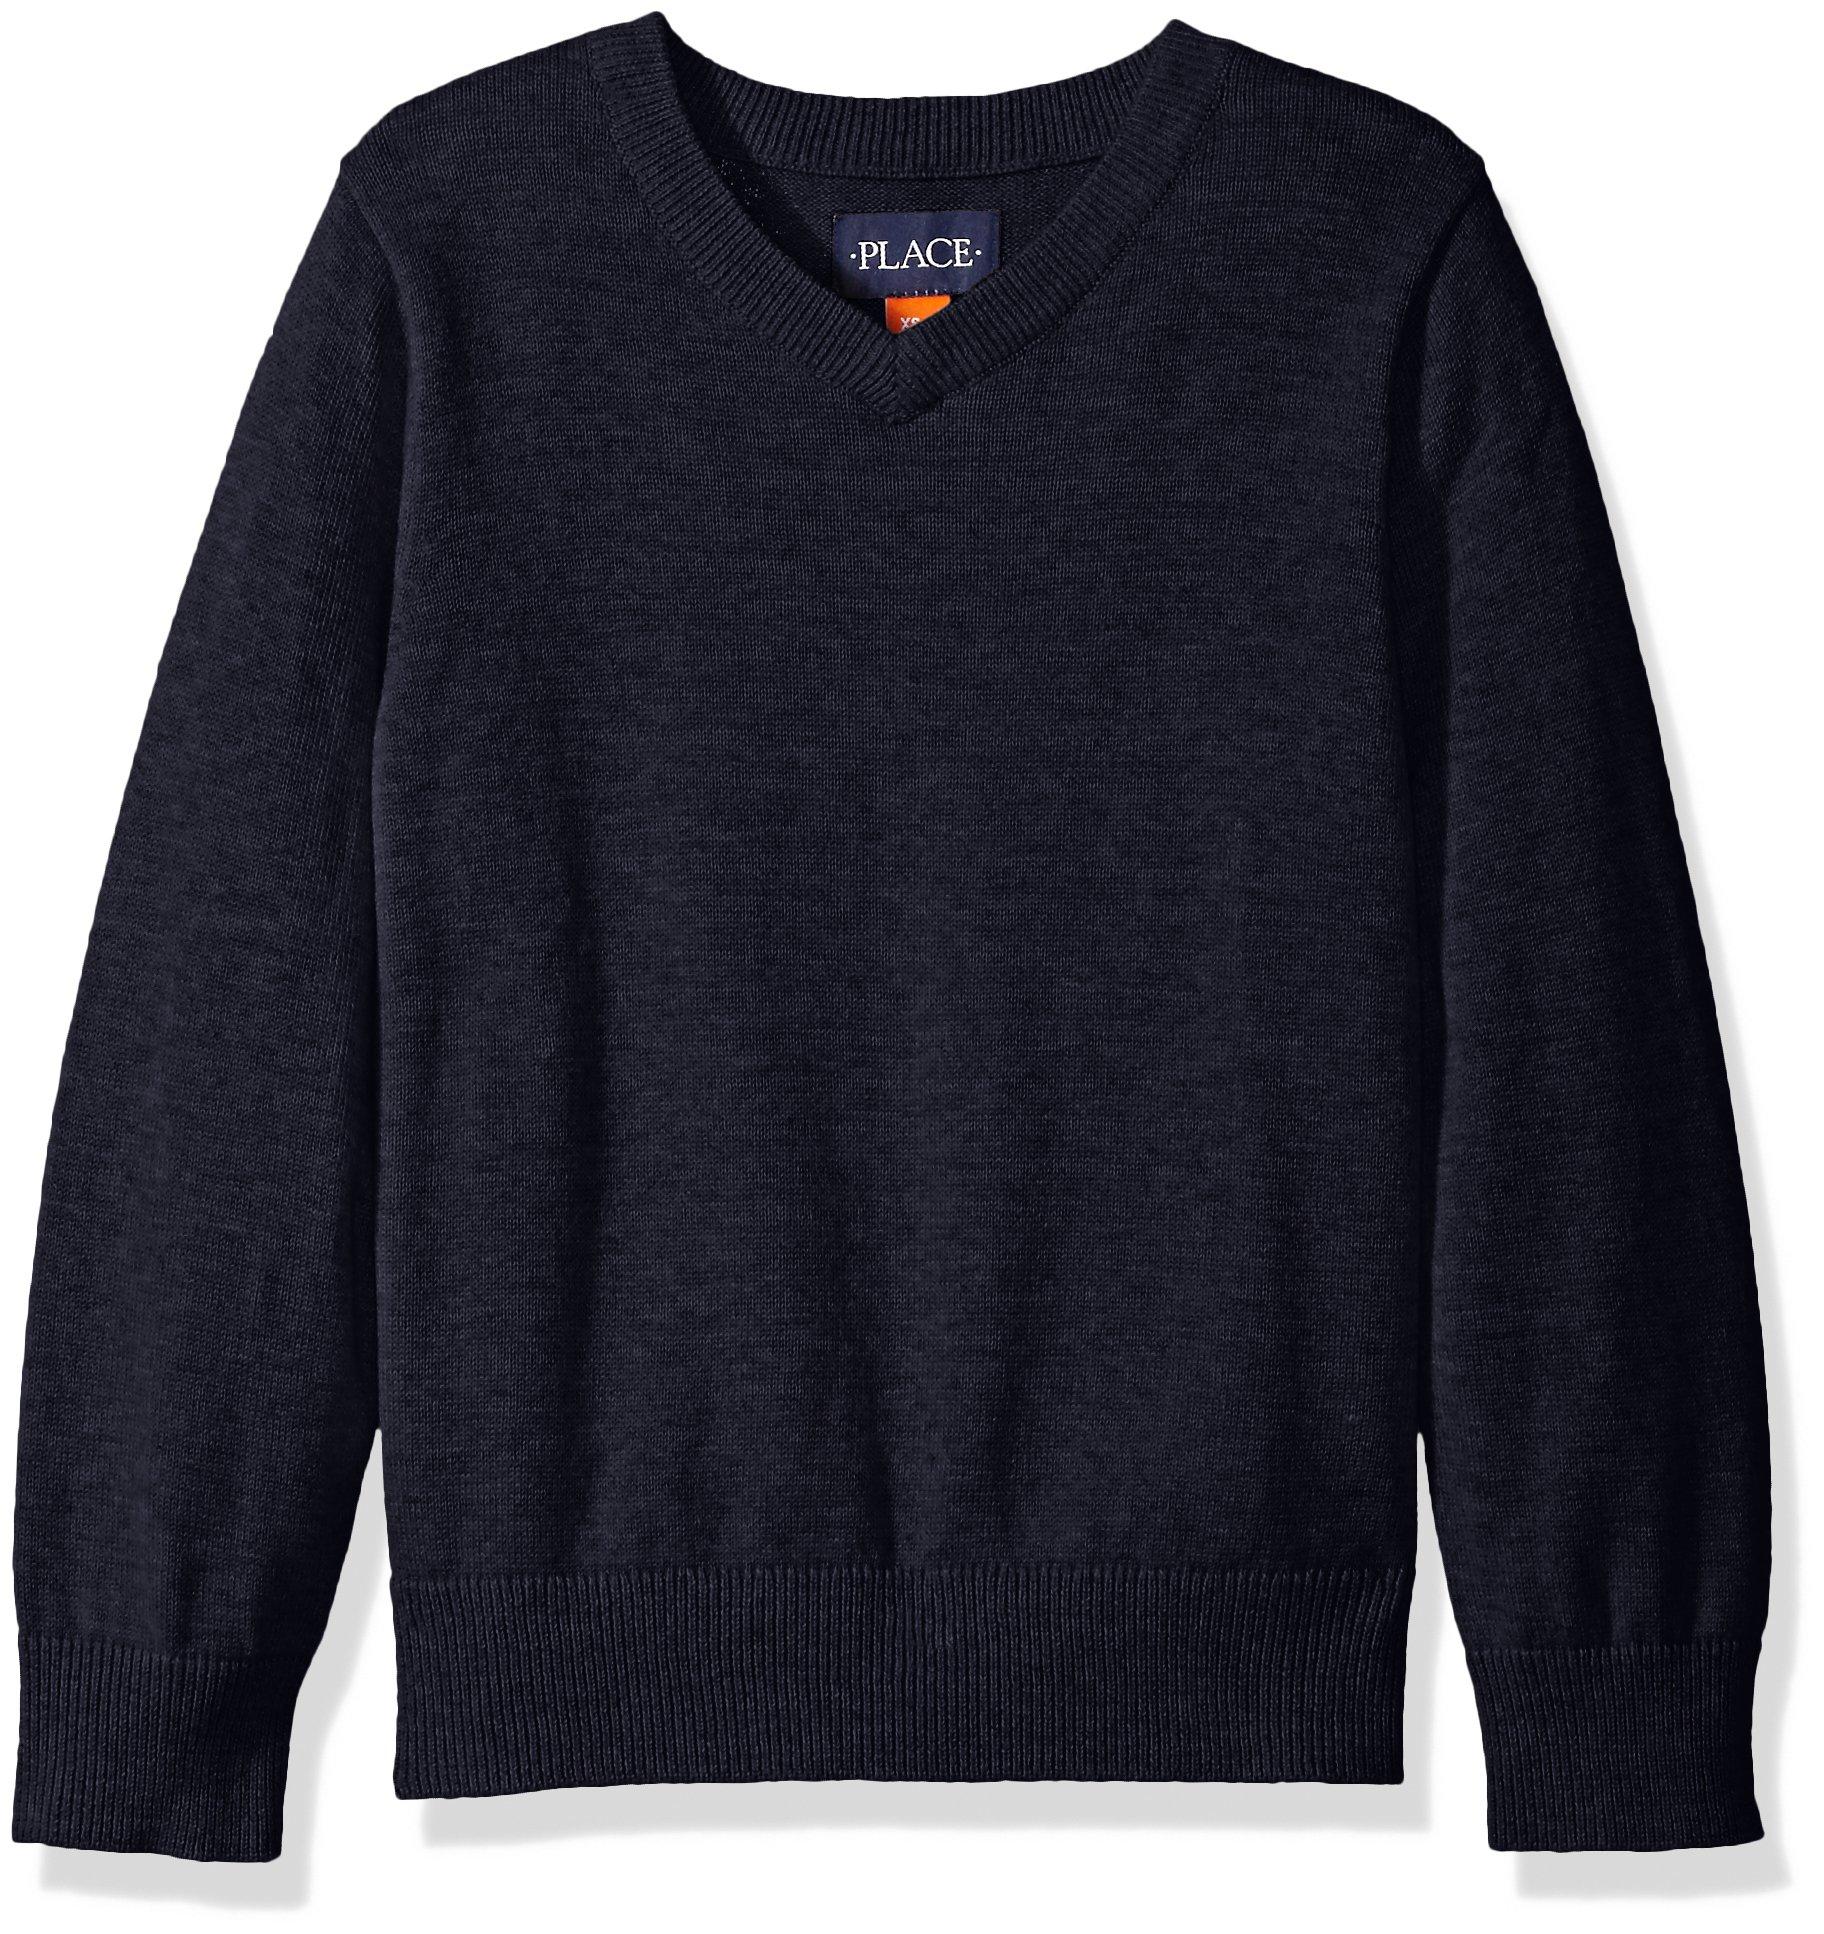 The Children's Place Little Boys' Uniform V-Neck Sweater Vest, Tidal, Small/5/6